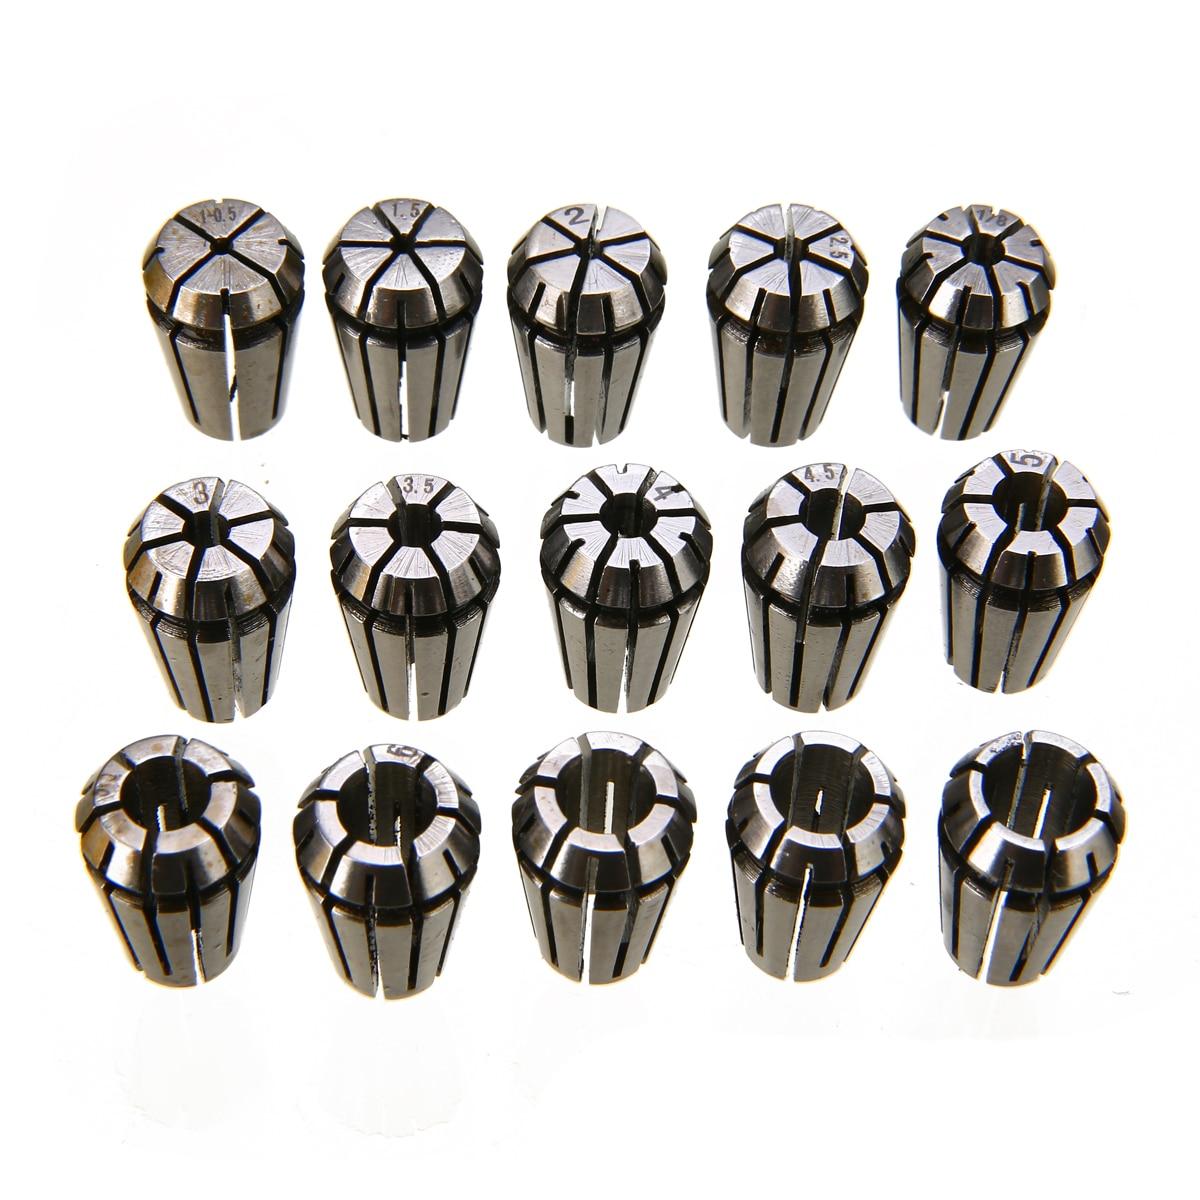 15pcs/set ER11 Spring Collet Set 1-7mm Precision Collet Chuck Set For CNC Engraving Machine Lathe Mill Tool